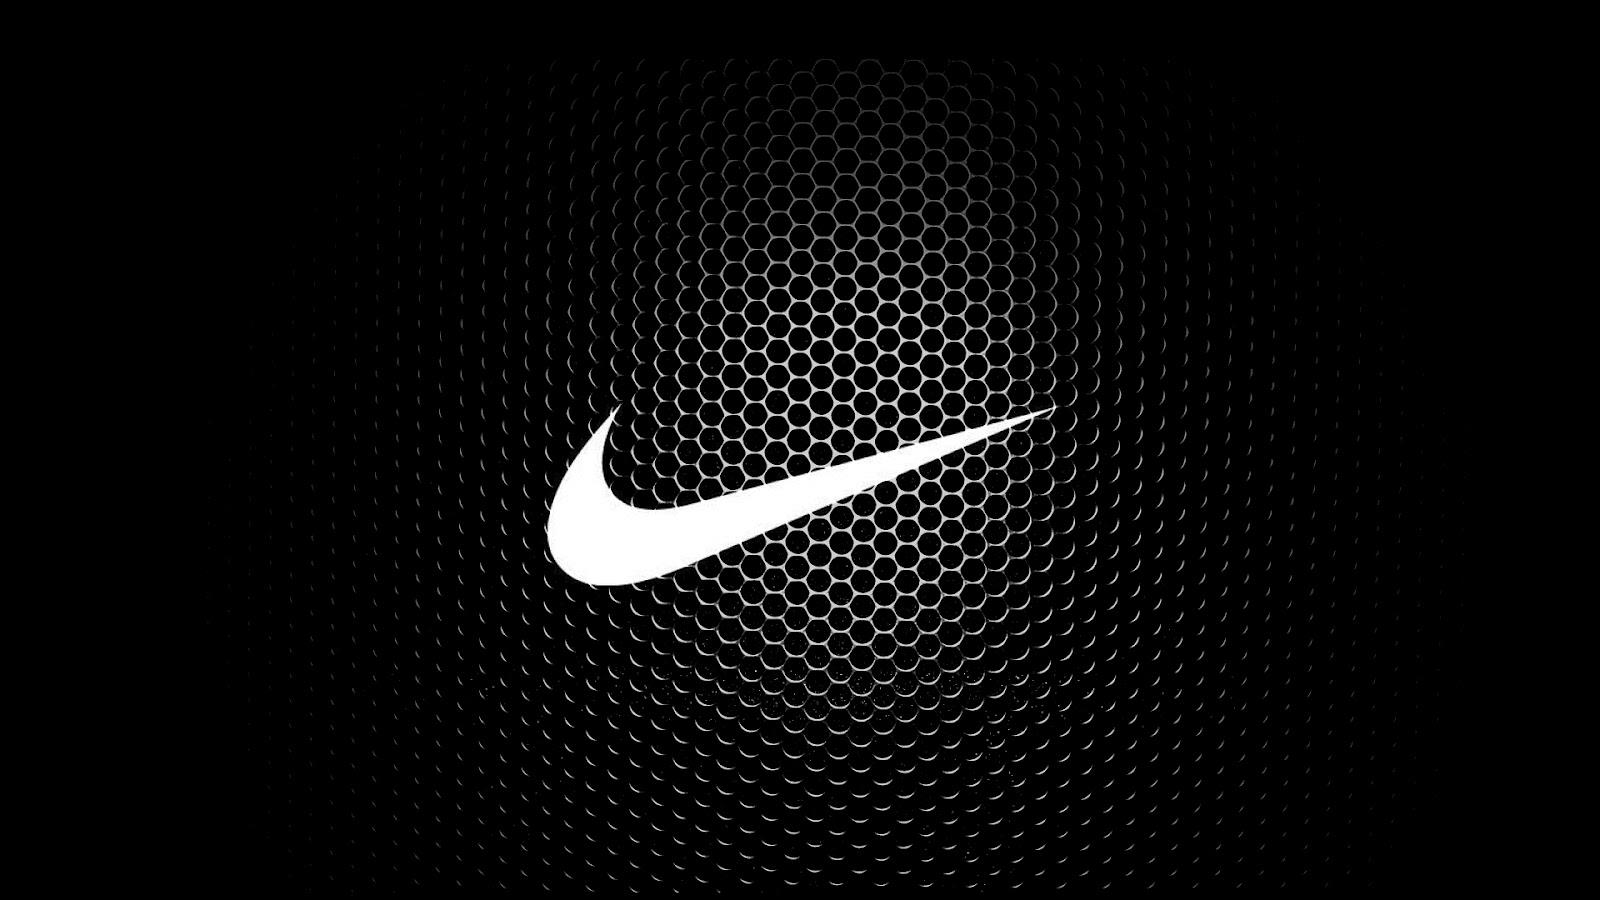 Reino amortiguar gritar  Nike Store: de Consumidor a Héroe | Branzai | Branding y Marcas